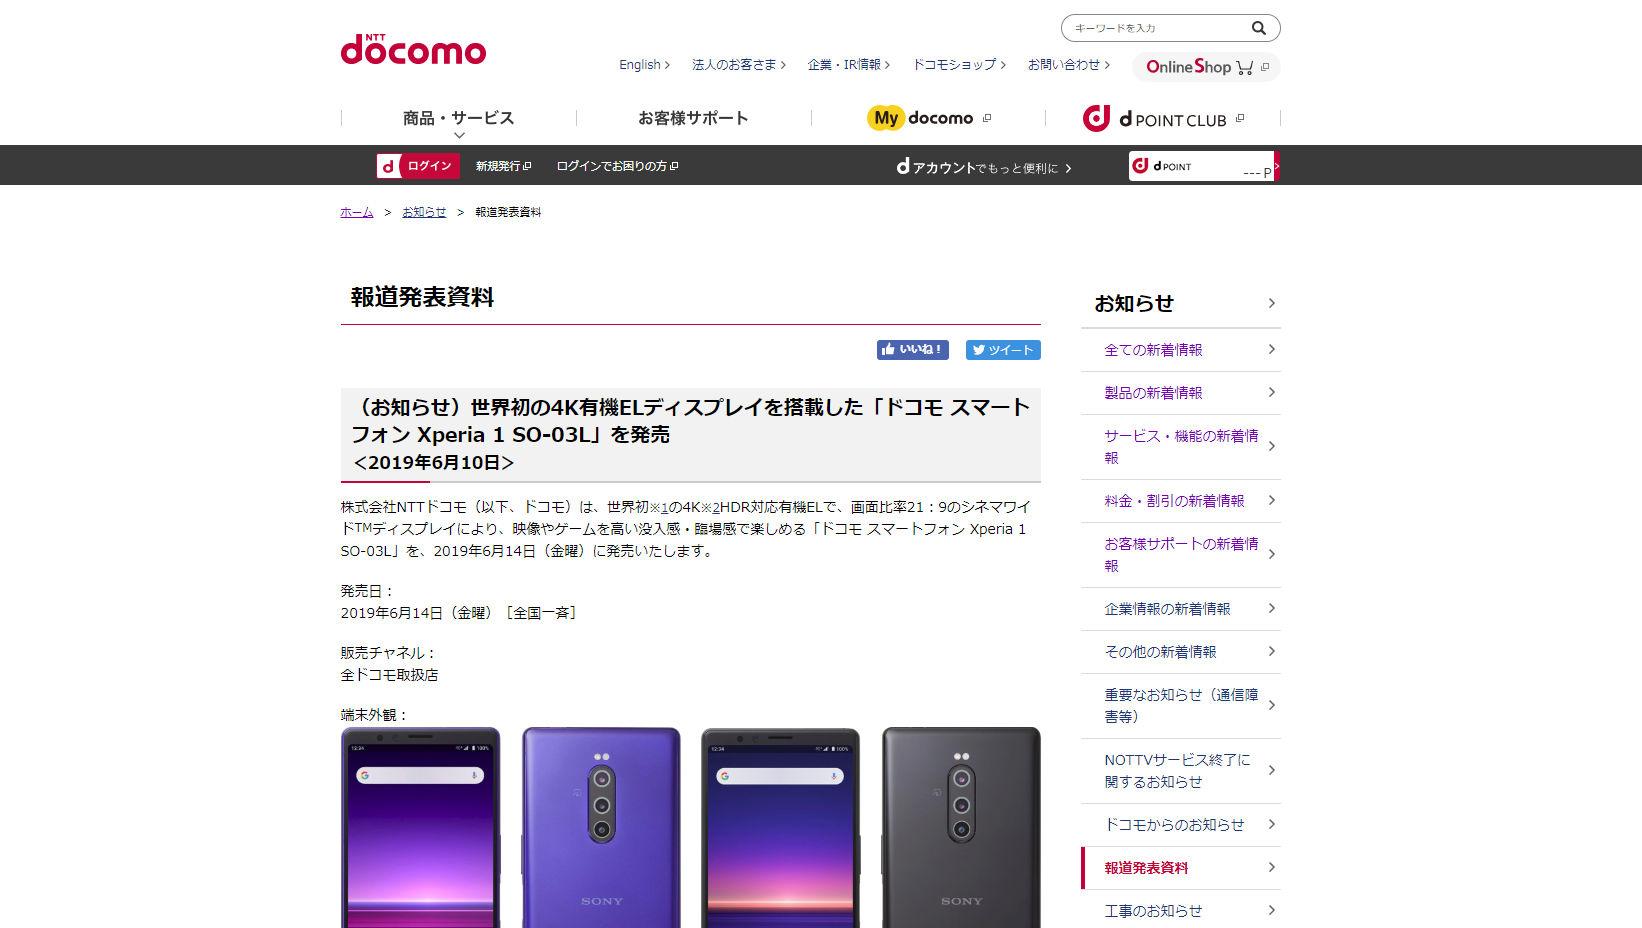 Xperia 1 SO-03L の発売告知